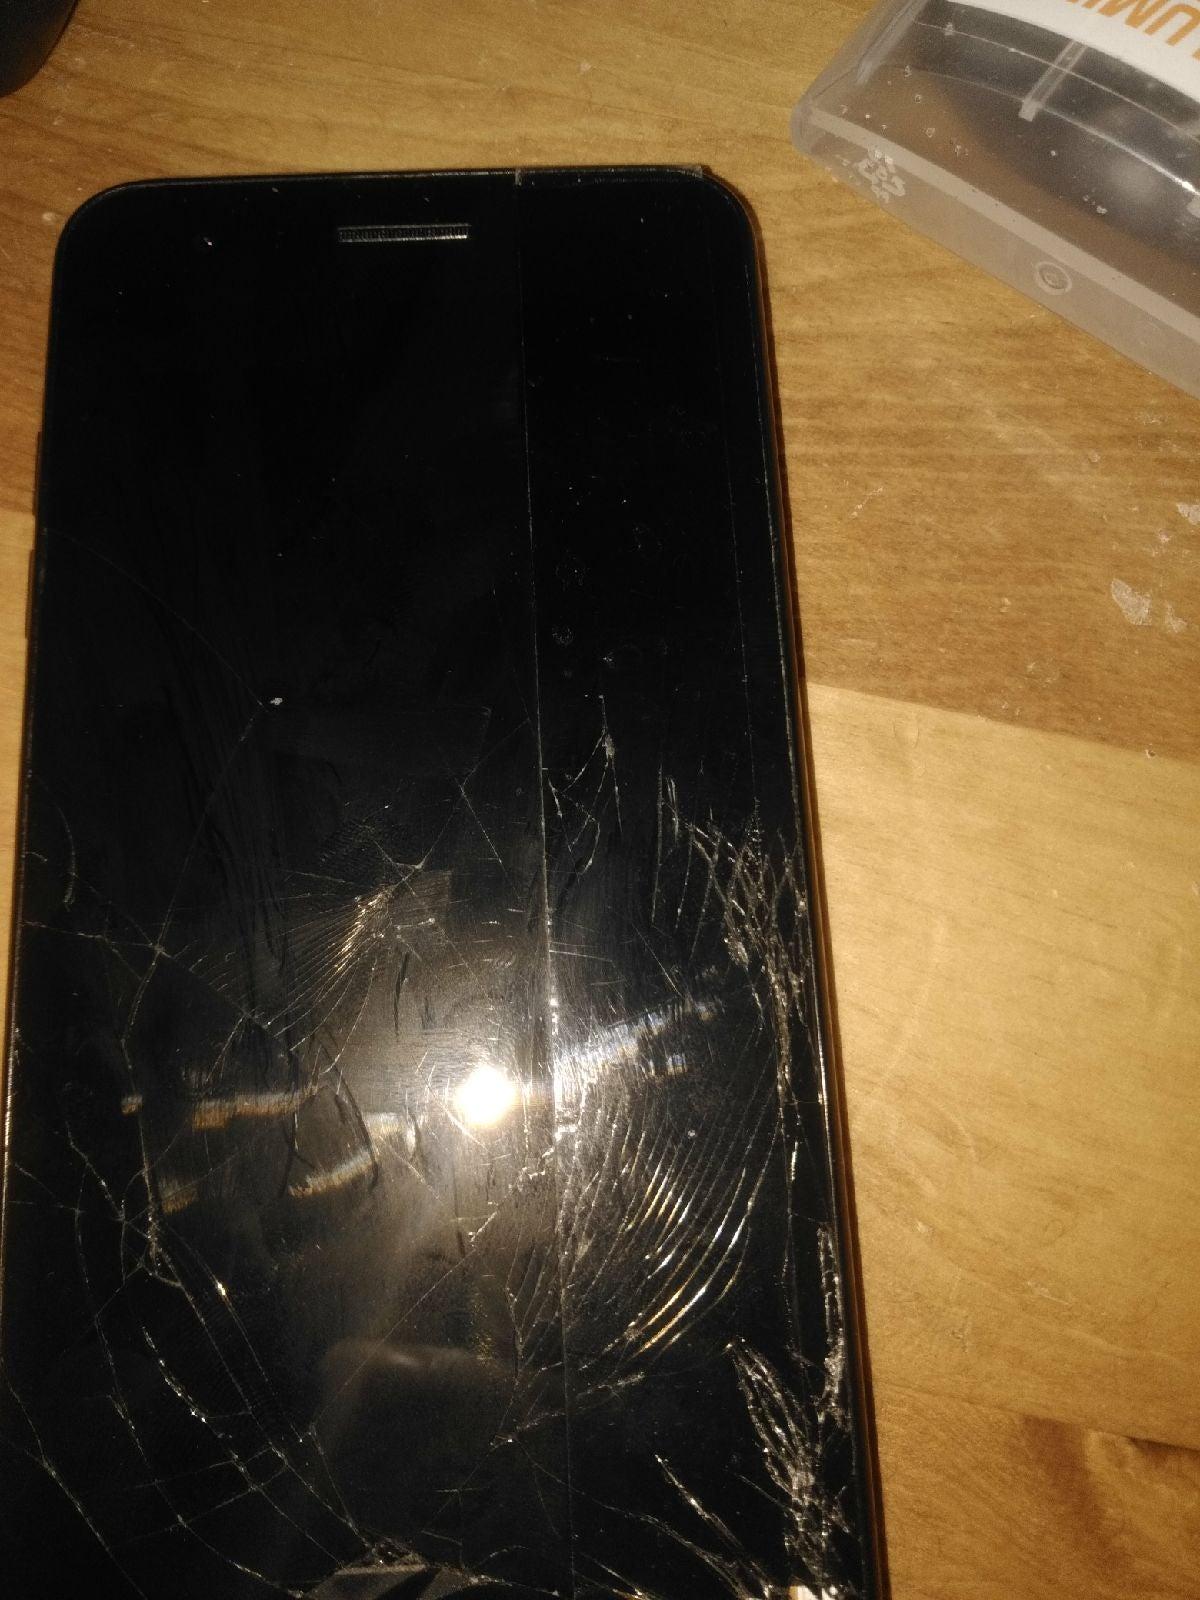 My LG Phone